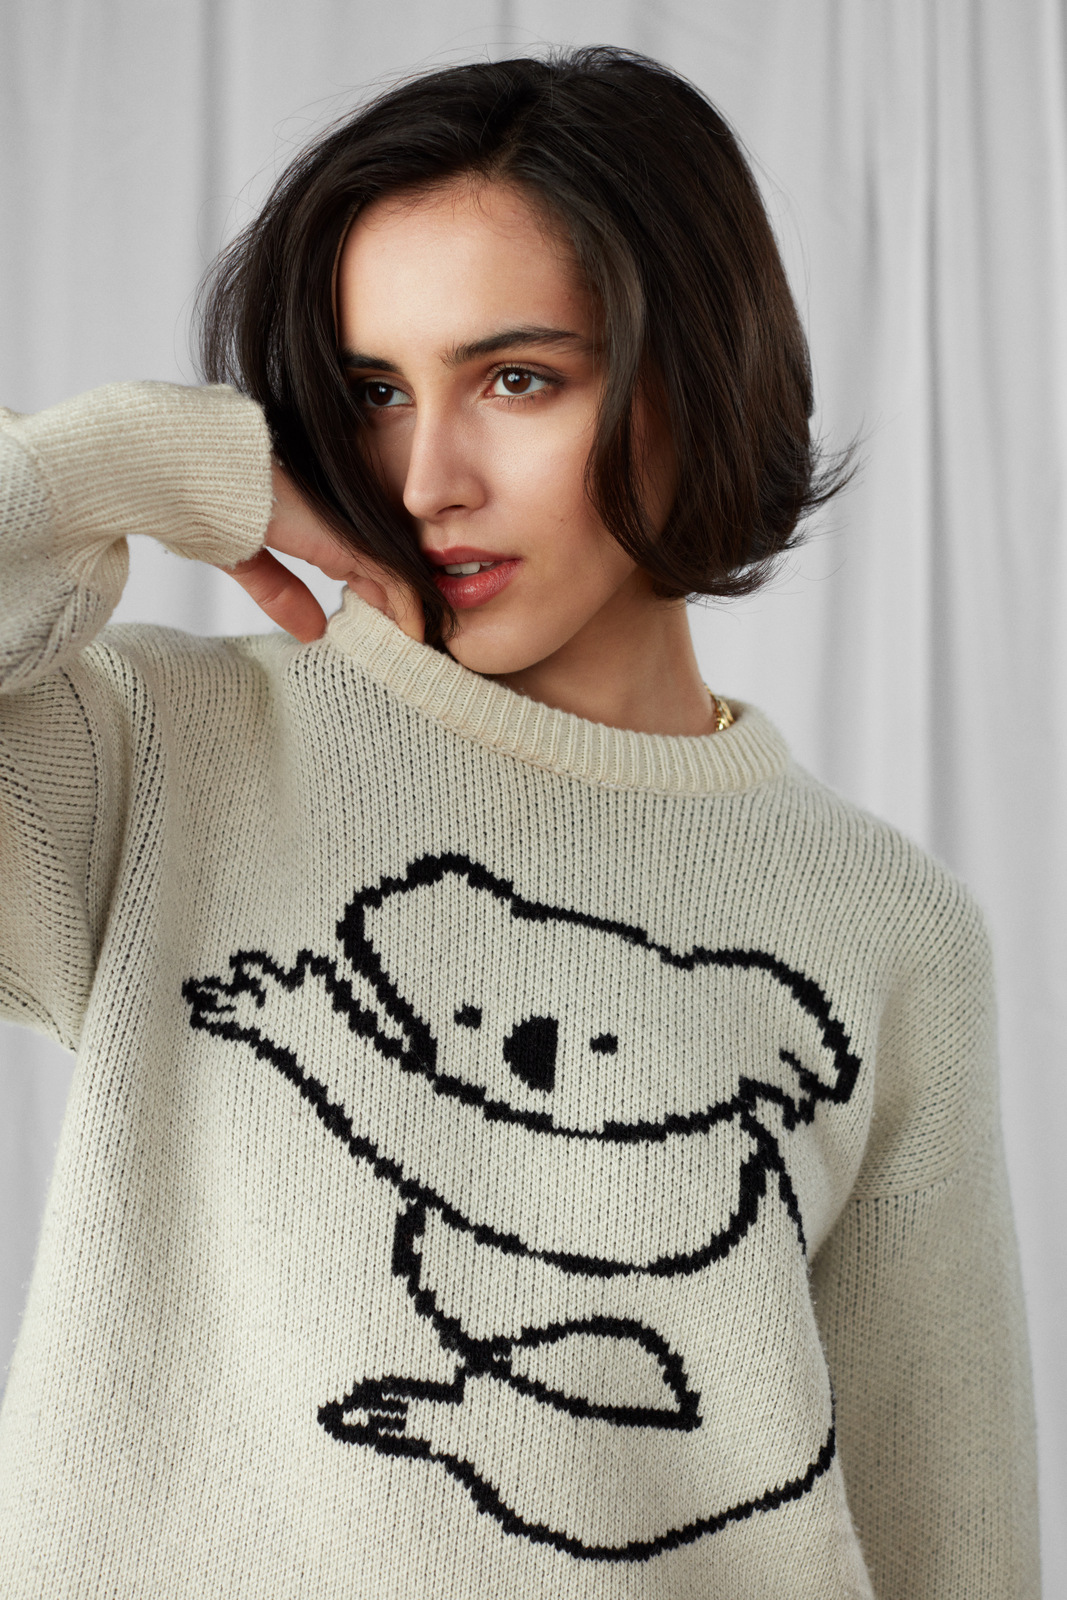 Koala Sweater by Ami Amalia on curated-crowd.com